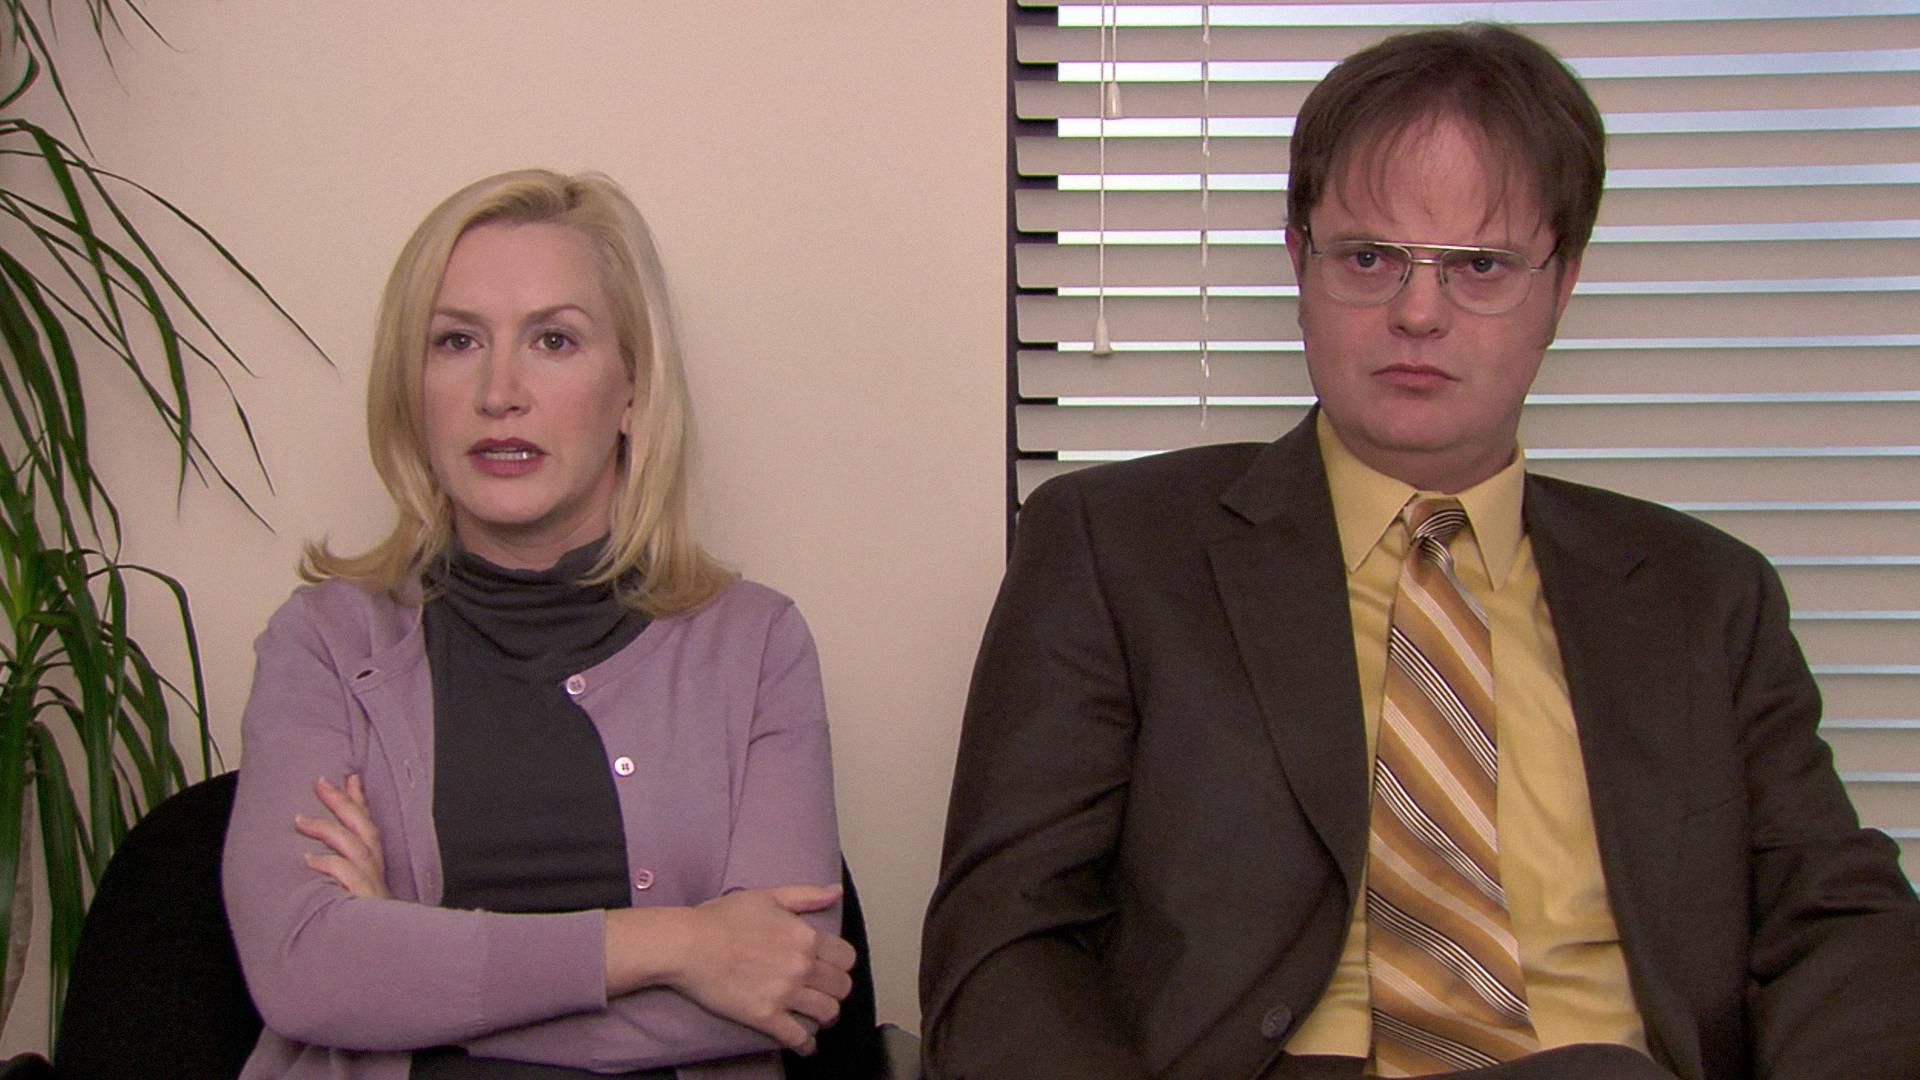 The Office Season 6 Episode 25